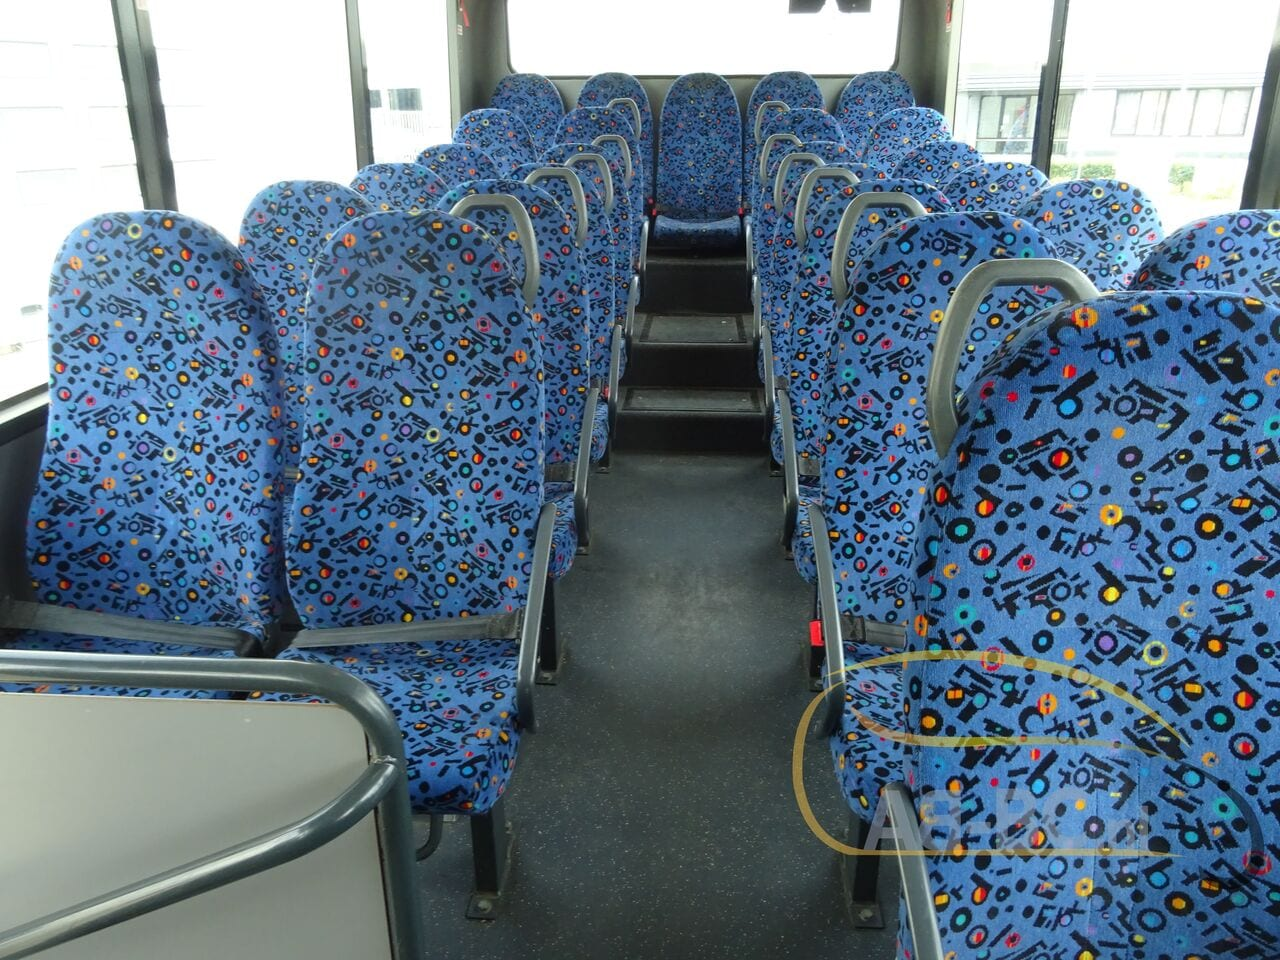 interurban-busMAN-Fast-64-seats---1619619998851149551_big_f33ab6da58b4a59e05aaf91a5d80c60c--21042817163019598600